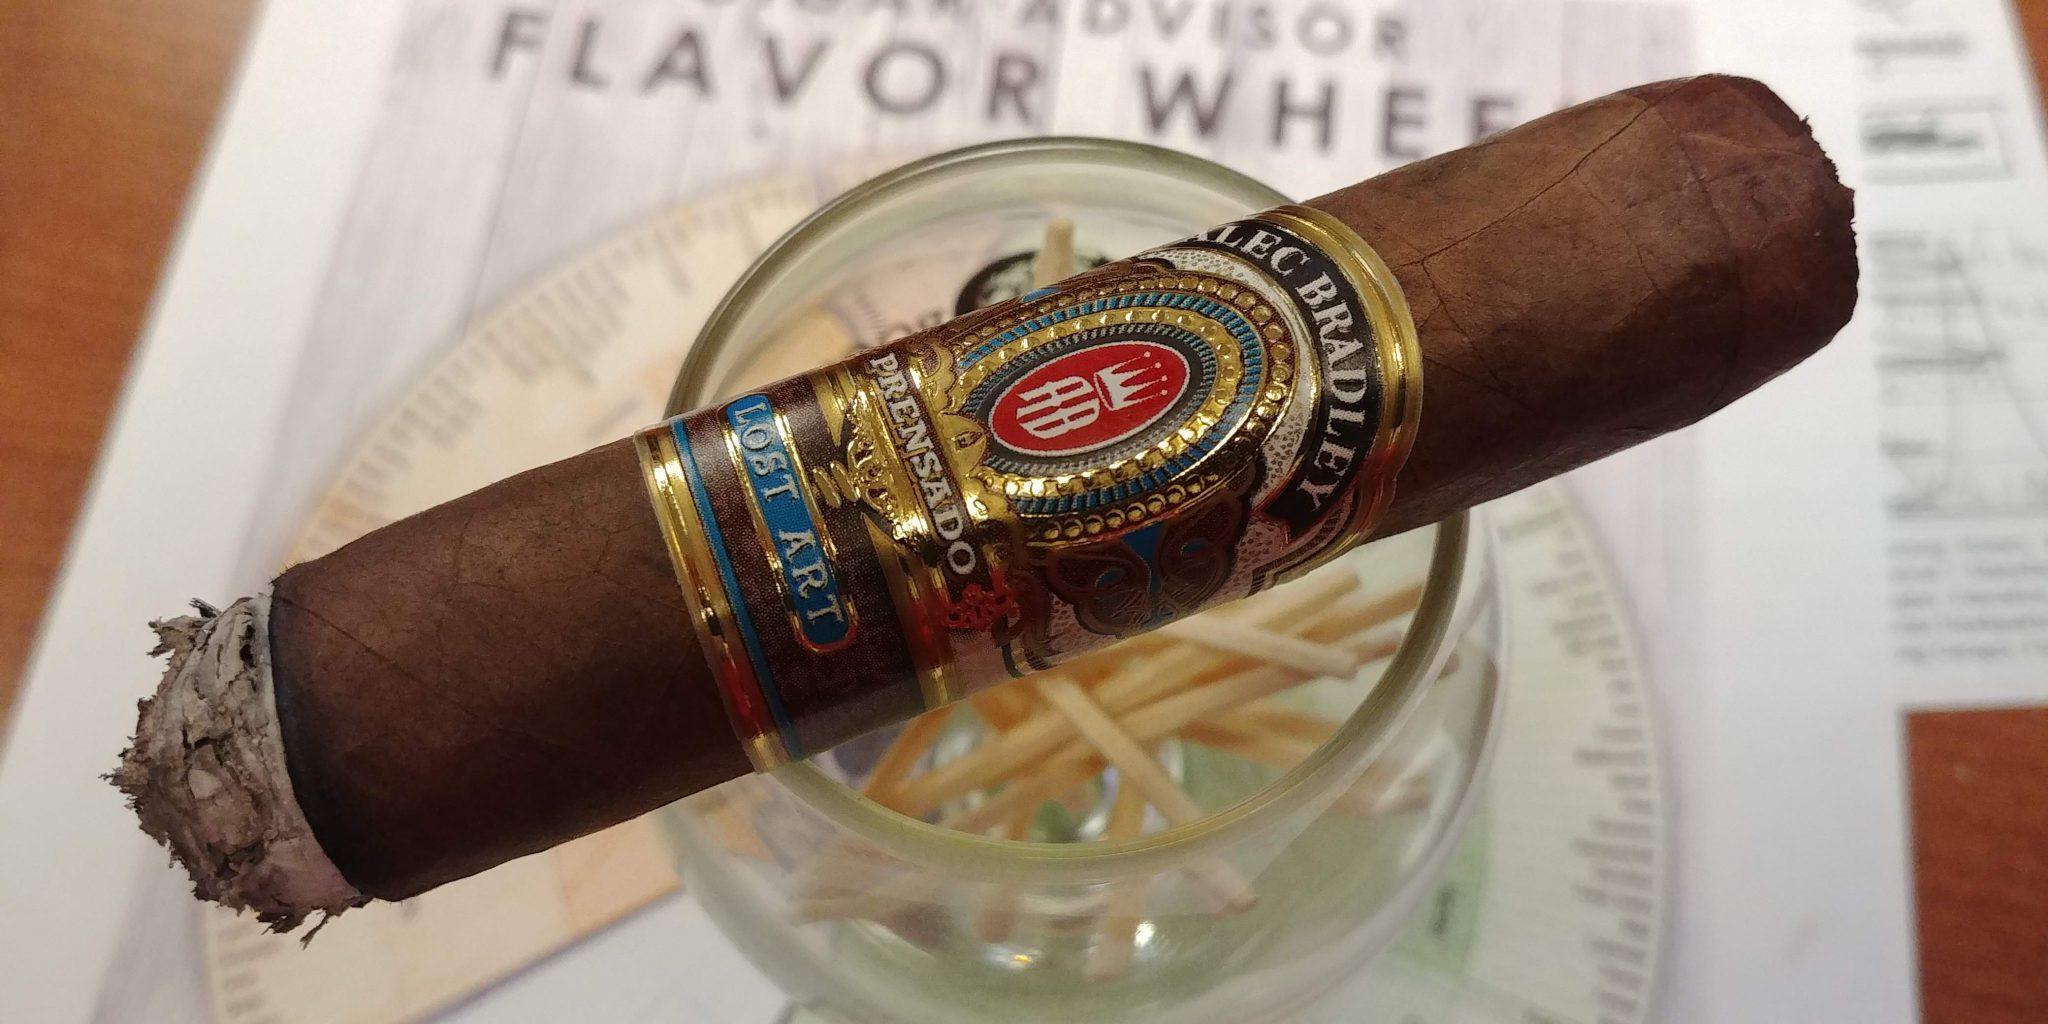 Alec Bradley cigars guide Alec Bradley Prensado Lost Art Robusto cigar review by John Pullo